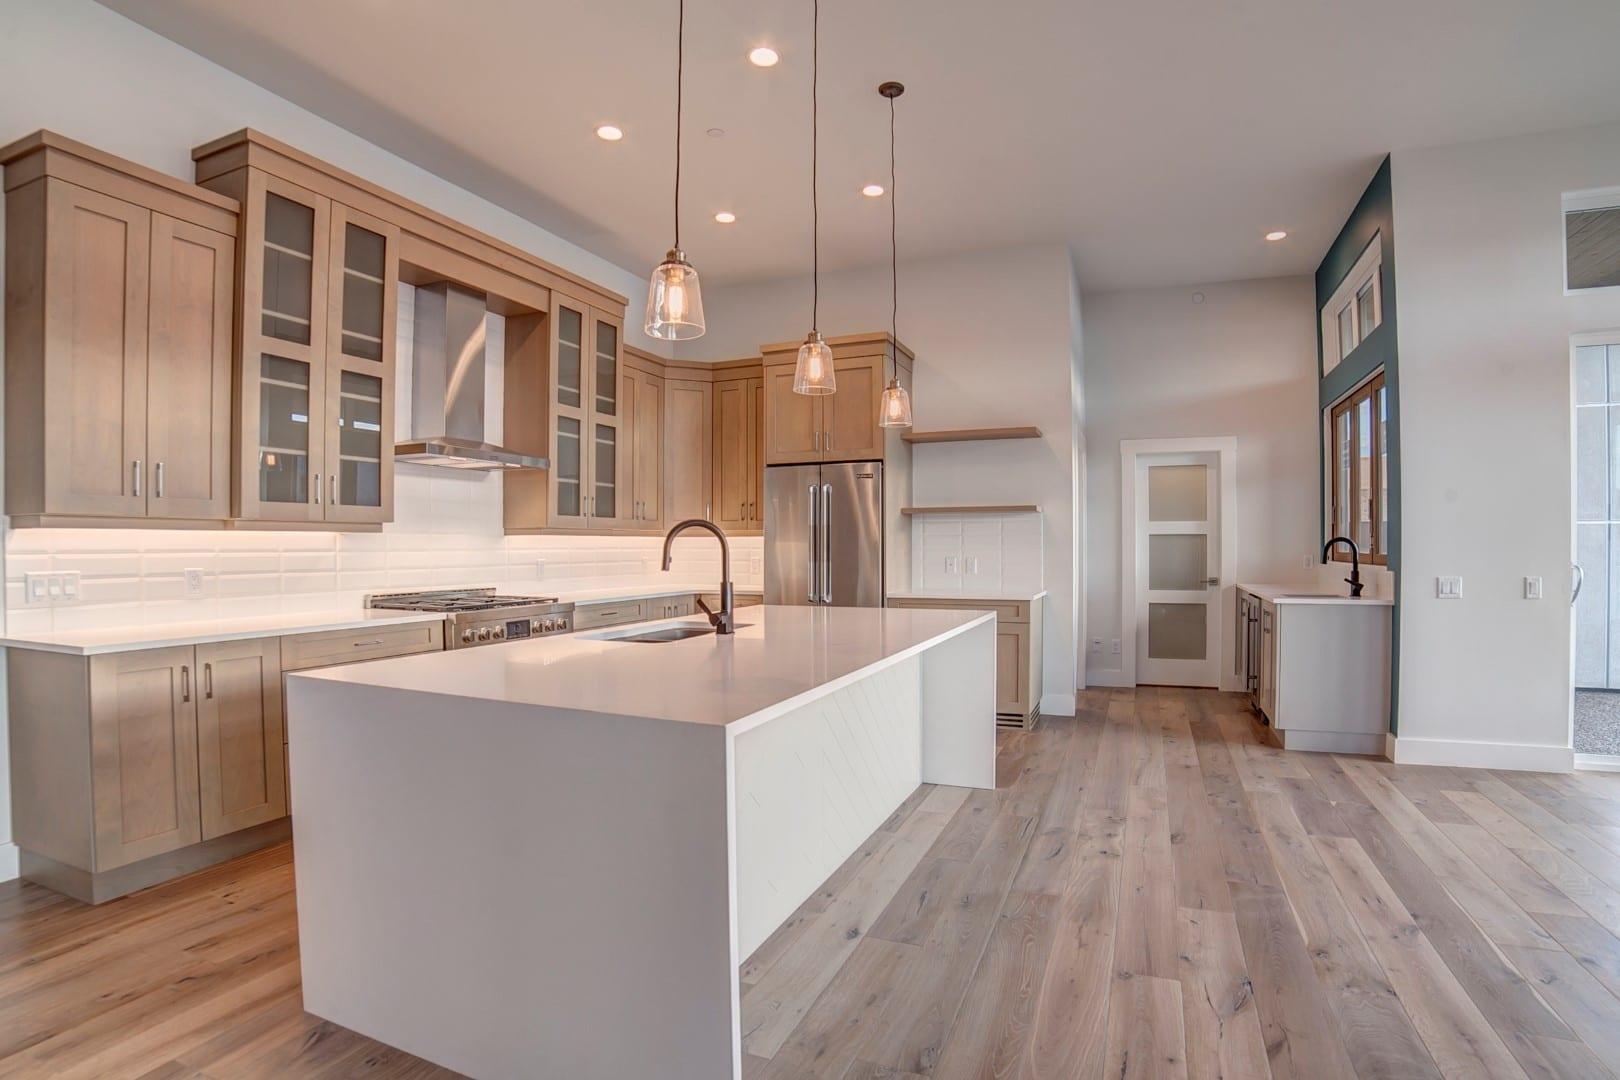 Mckinley beach show home kitchen rykon construction for Kitchen cabinets kelowna